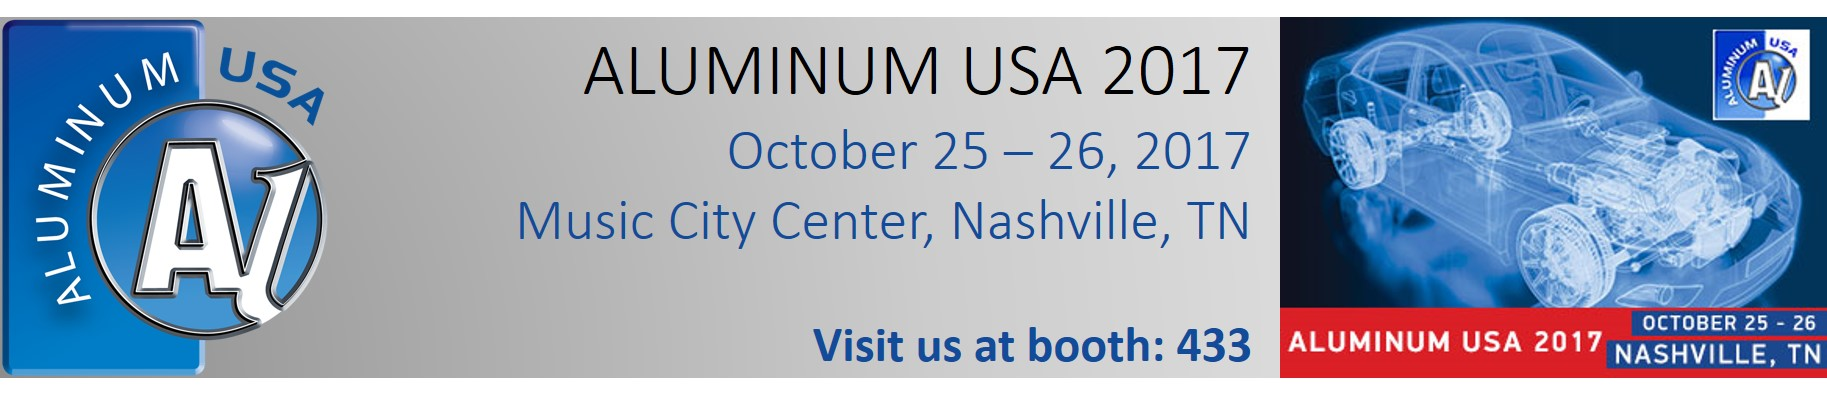 Aluminum USA 2017, October 25 – 26, Nashville TN